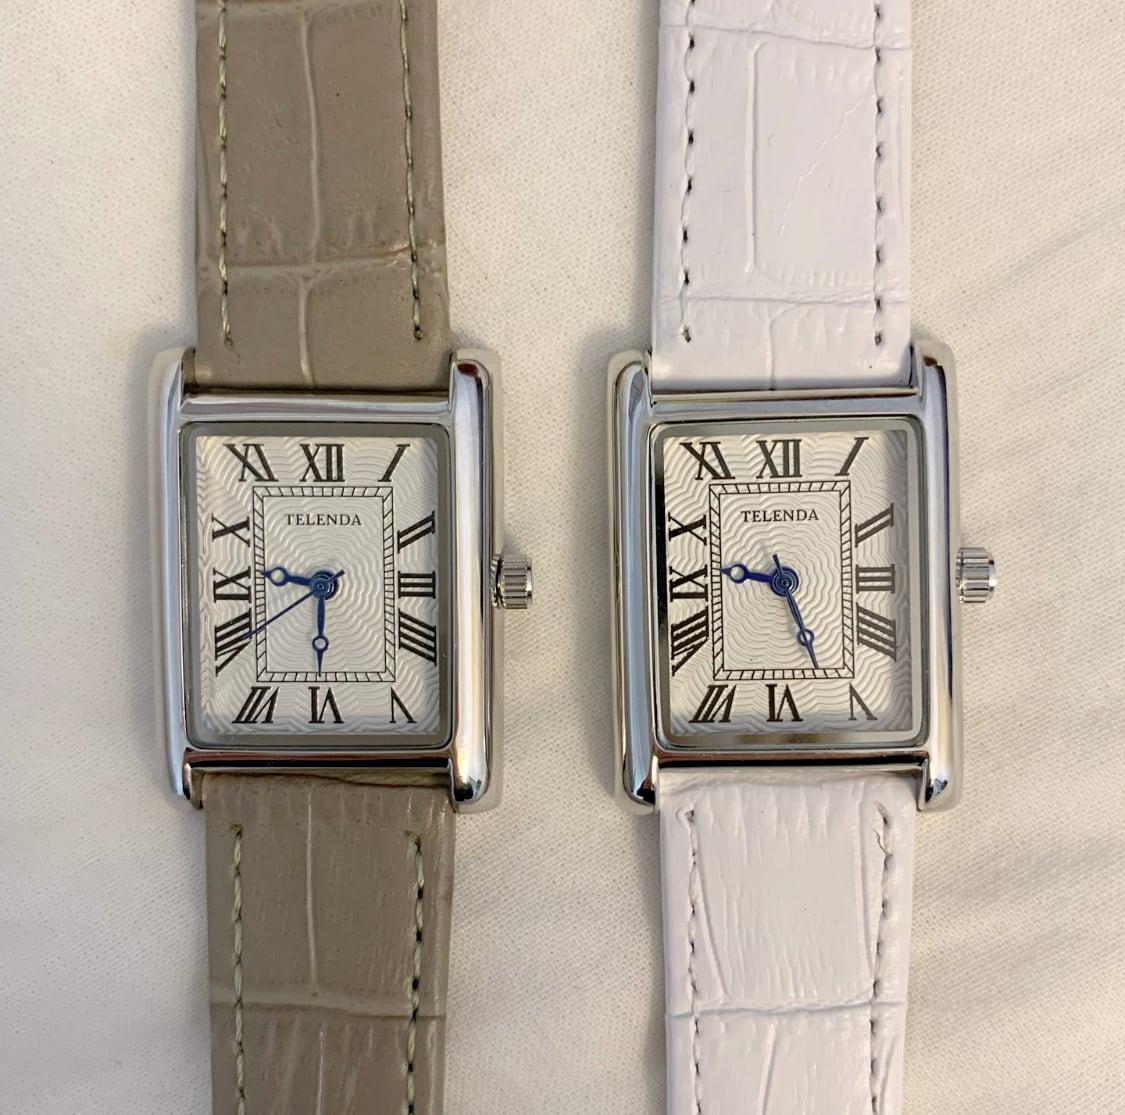 DAYNYC telenda watch(white/gray)